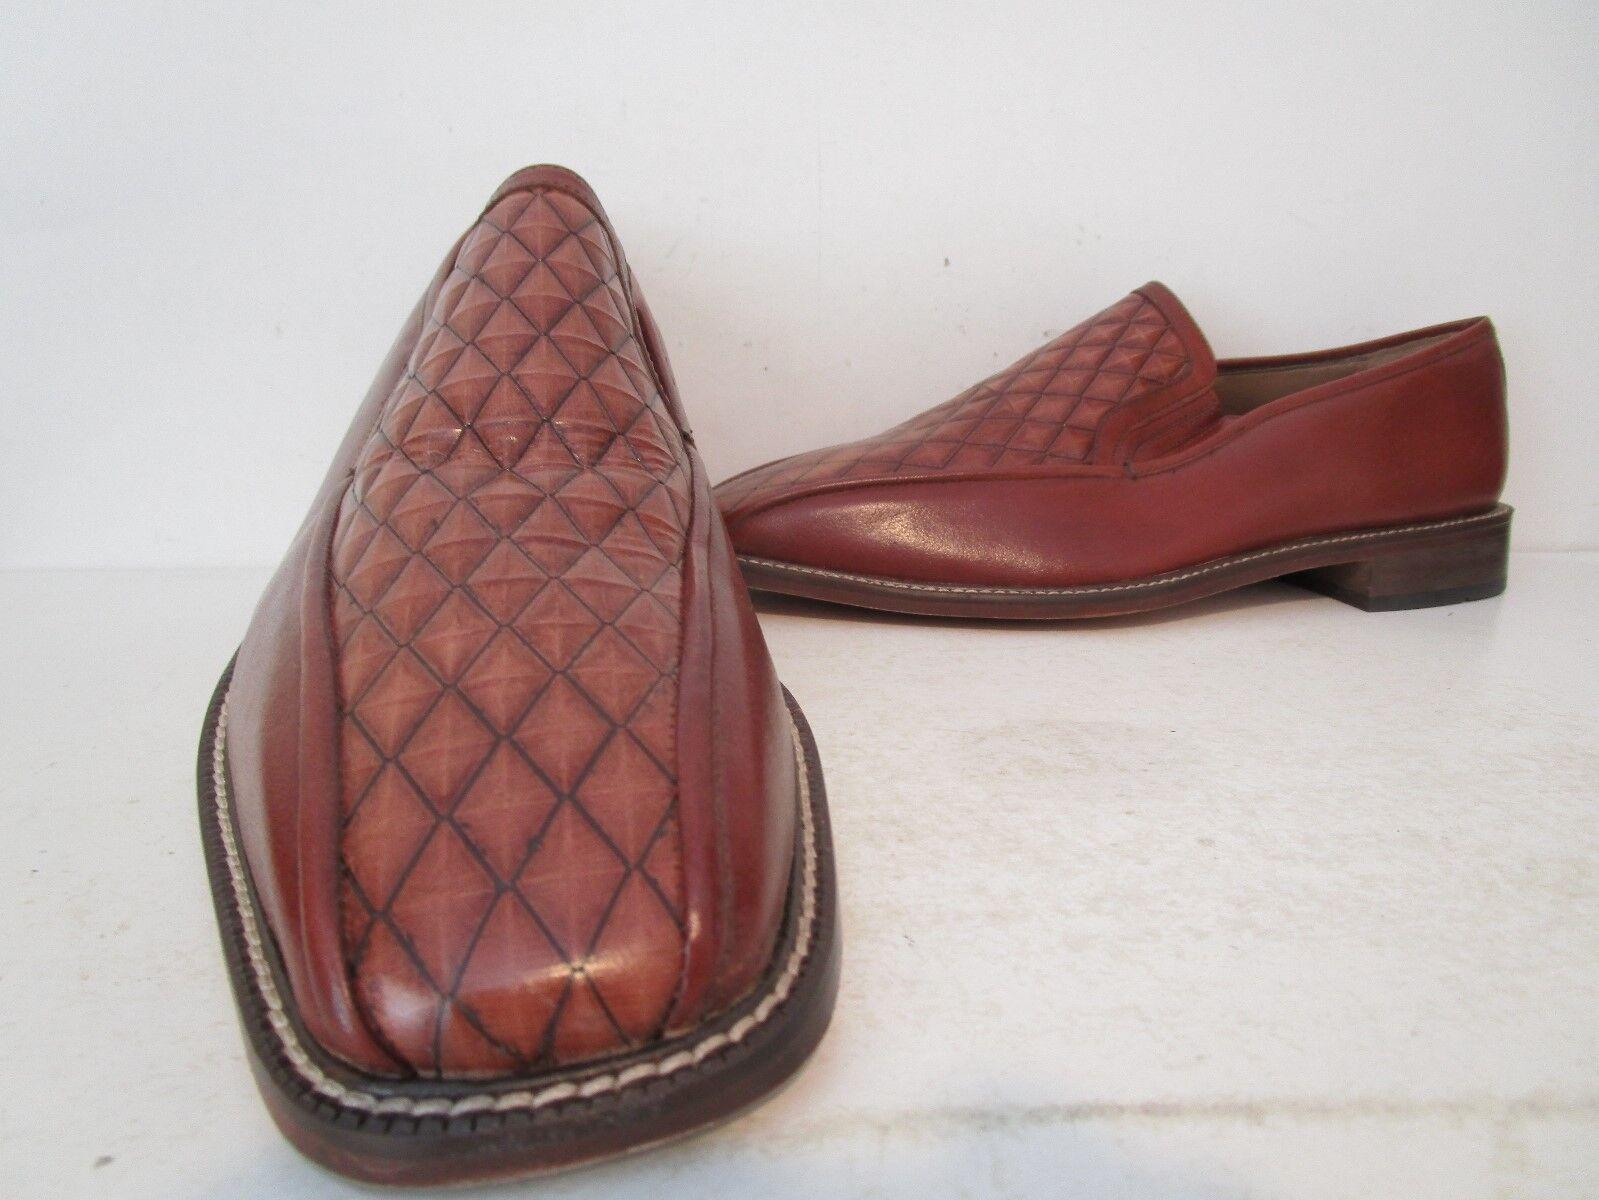 Stacy Adams Mens Garda Leather Casual Slip On Loafers Dress Shoe Cognac 13 12 M